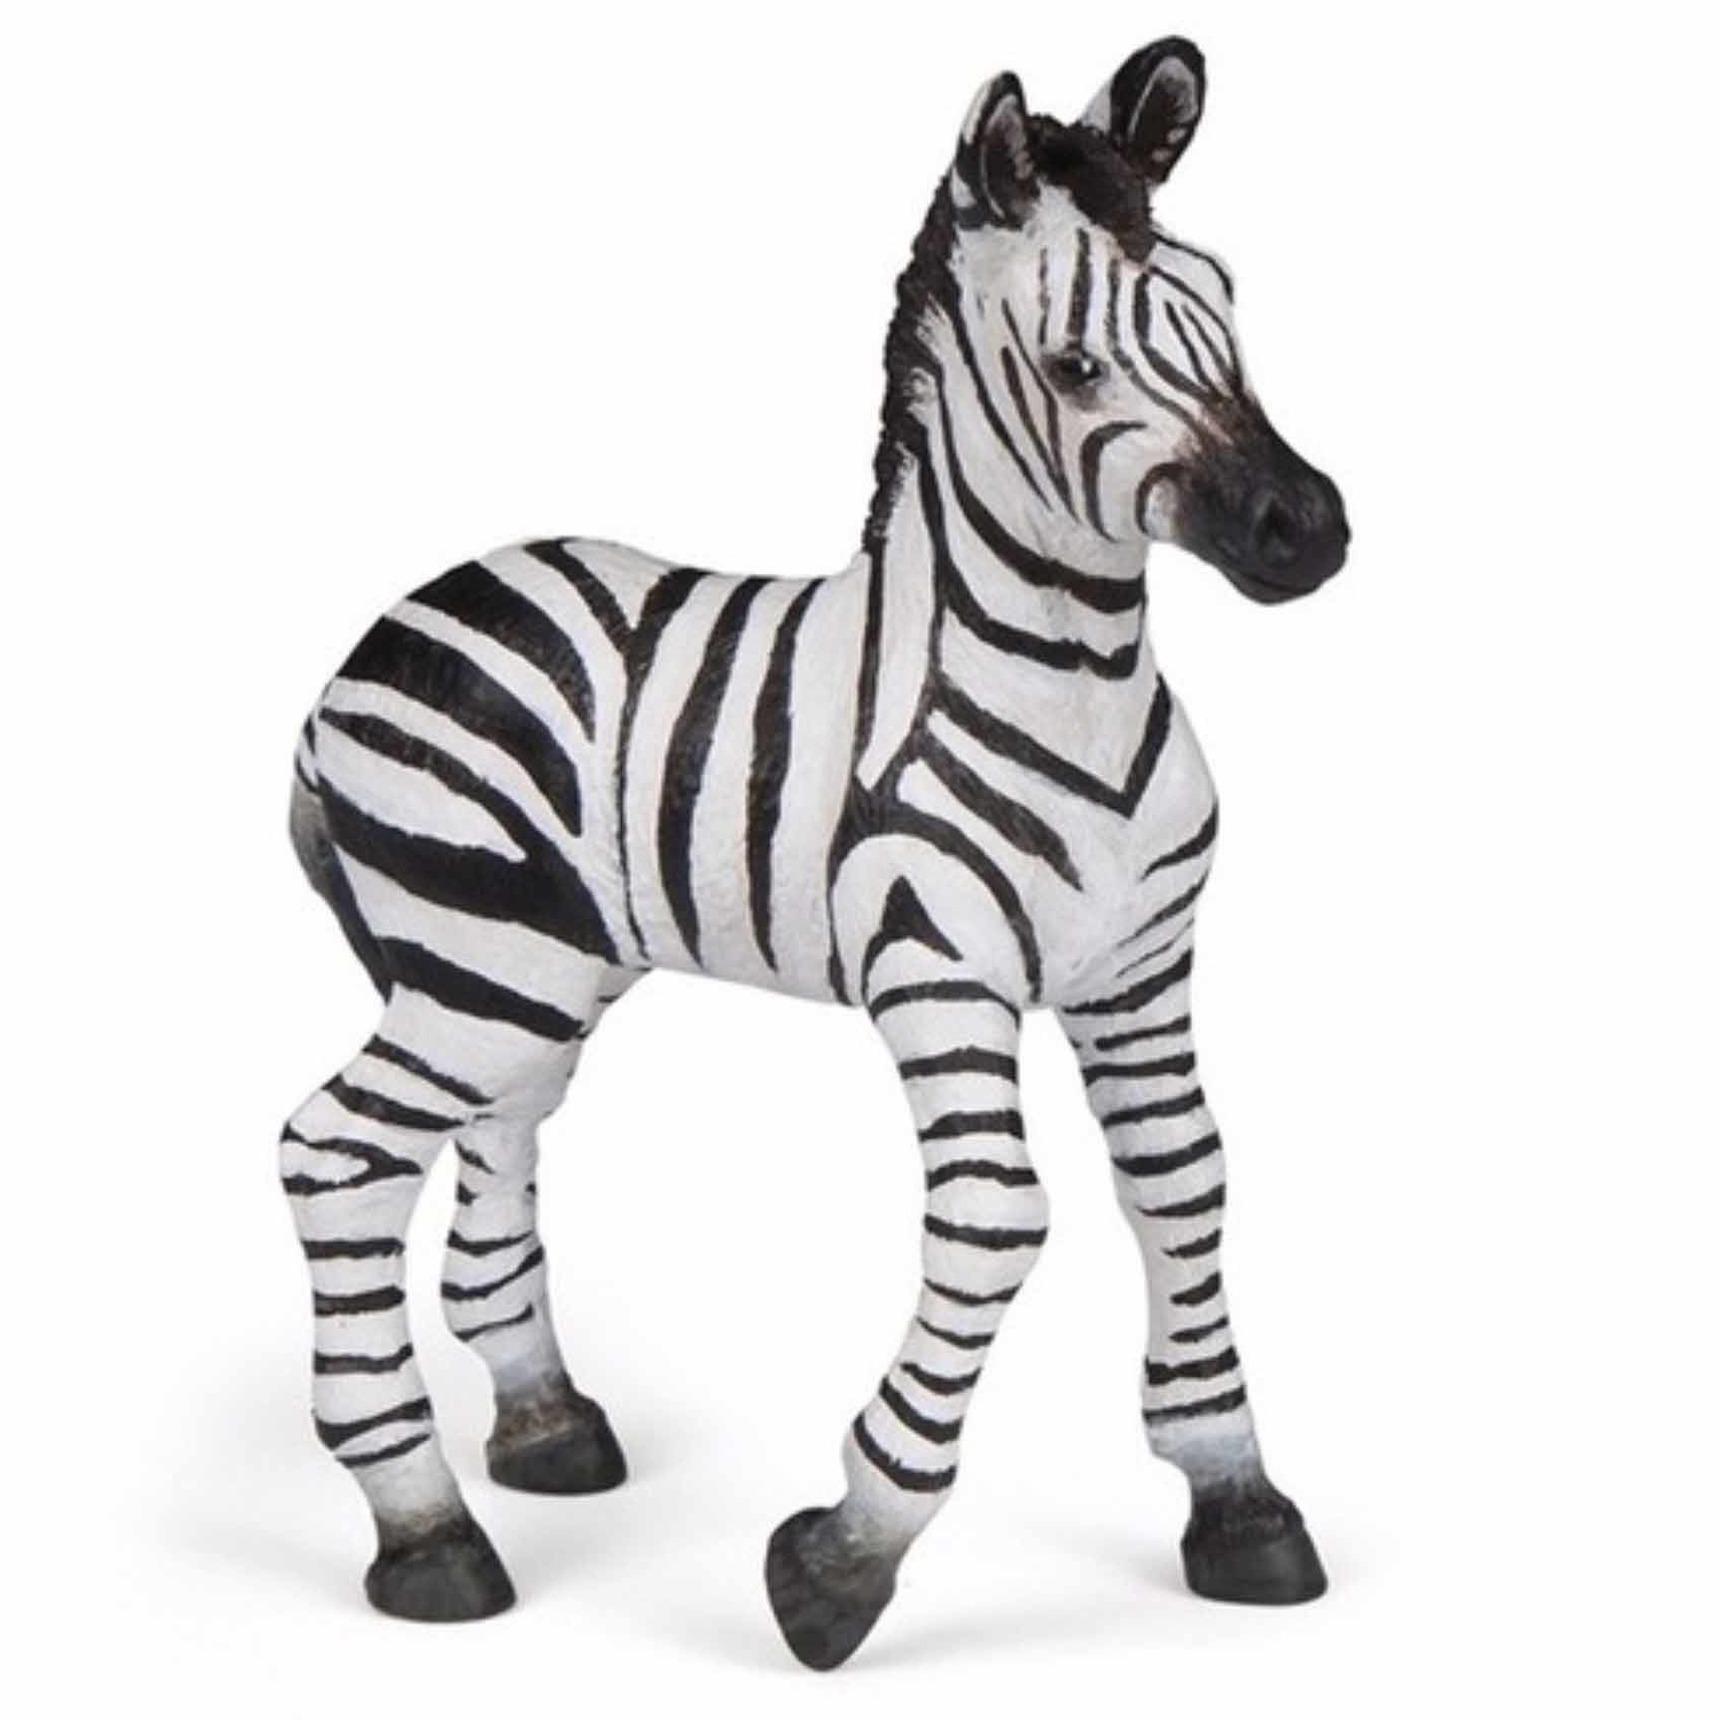 Plastic speelgoed figuur baby zebra 9 cm